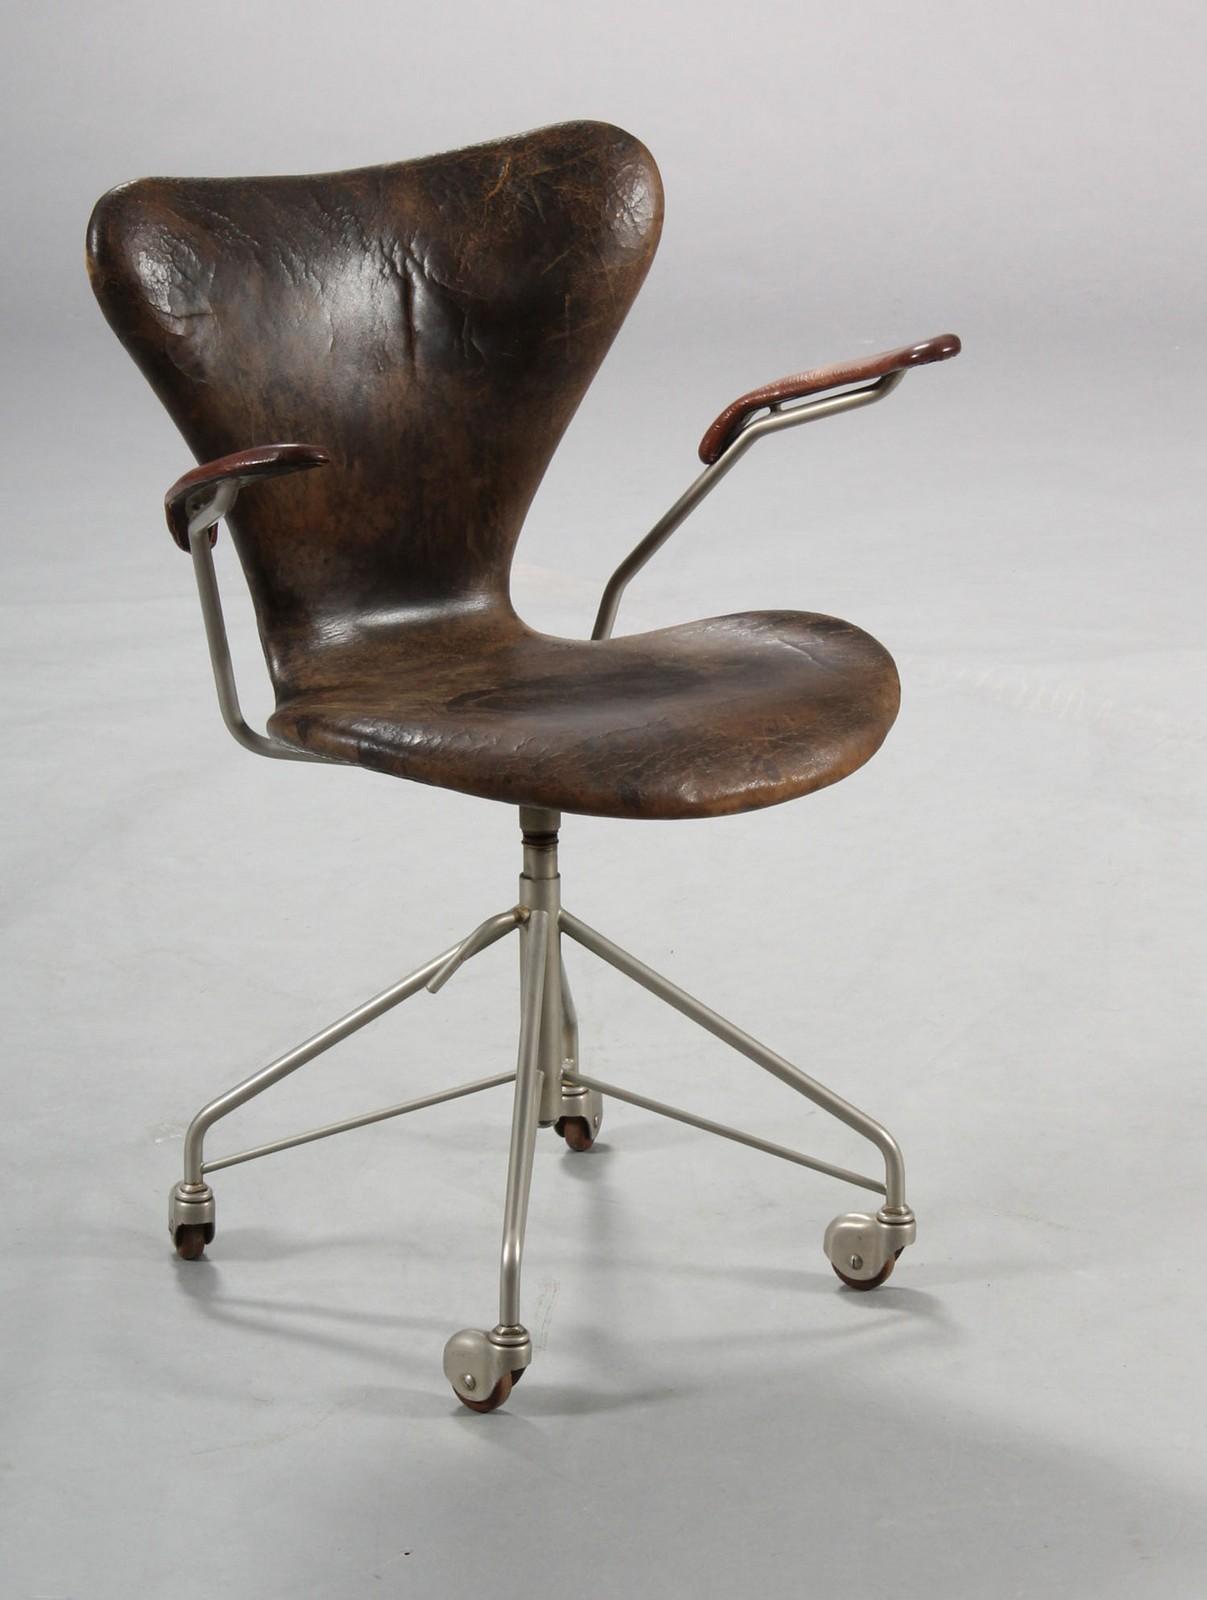 Arne Jacobsen. 7'er kontorstol, model 3217